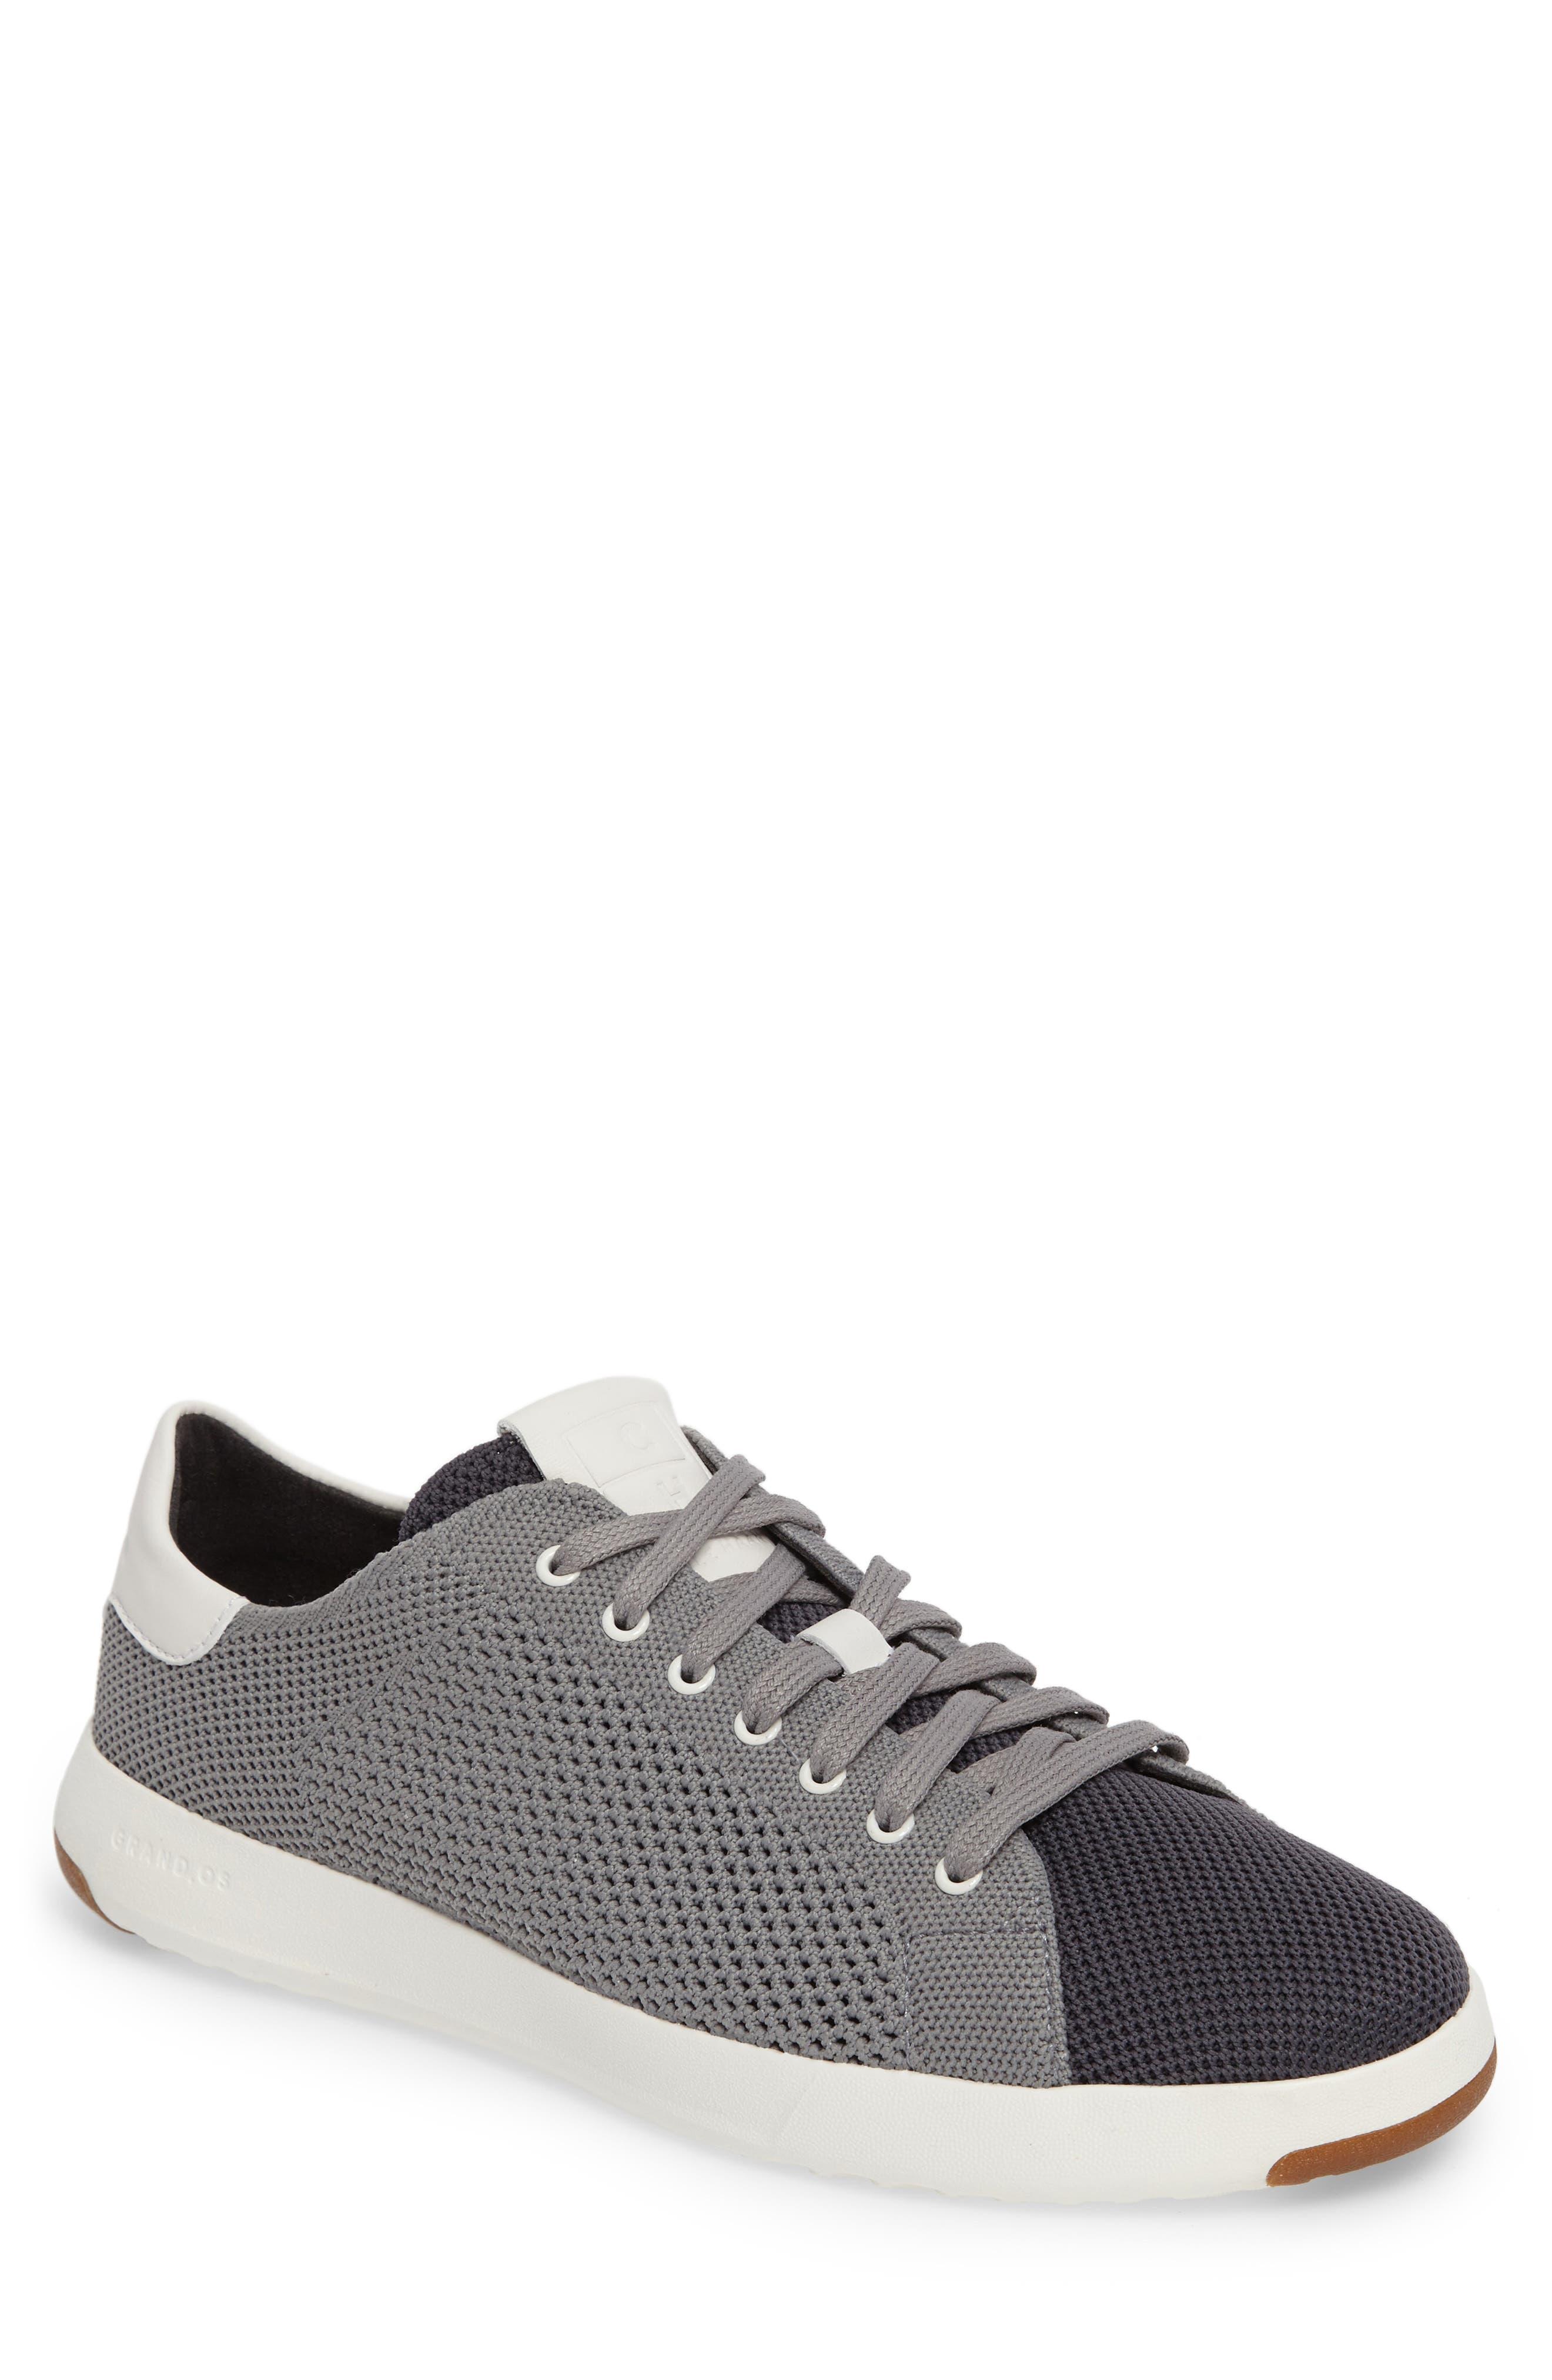 GrandPrø Stitchlite Tennis Sneaker,                             Main thumbnail 1, color,                             Magnet Grey Fabric